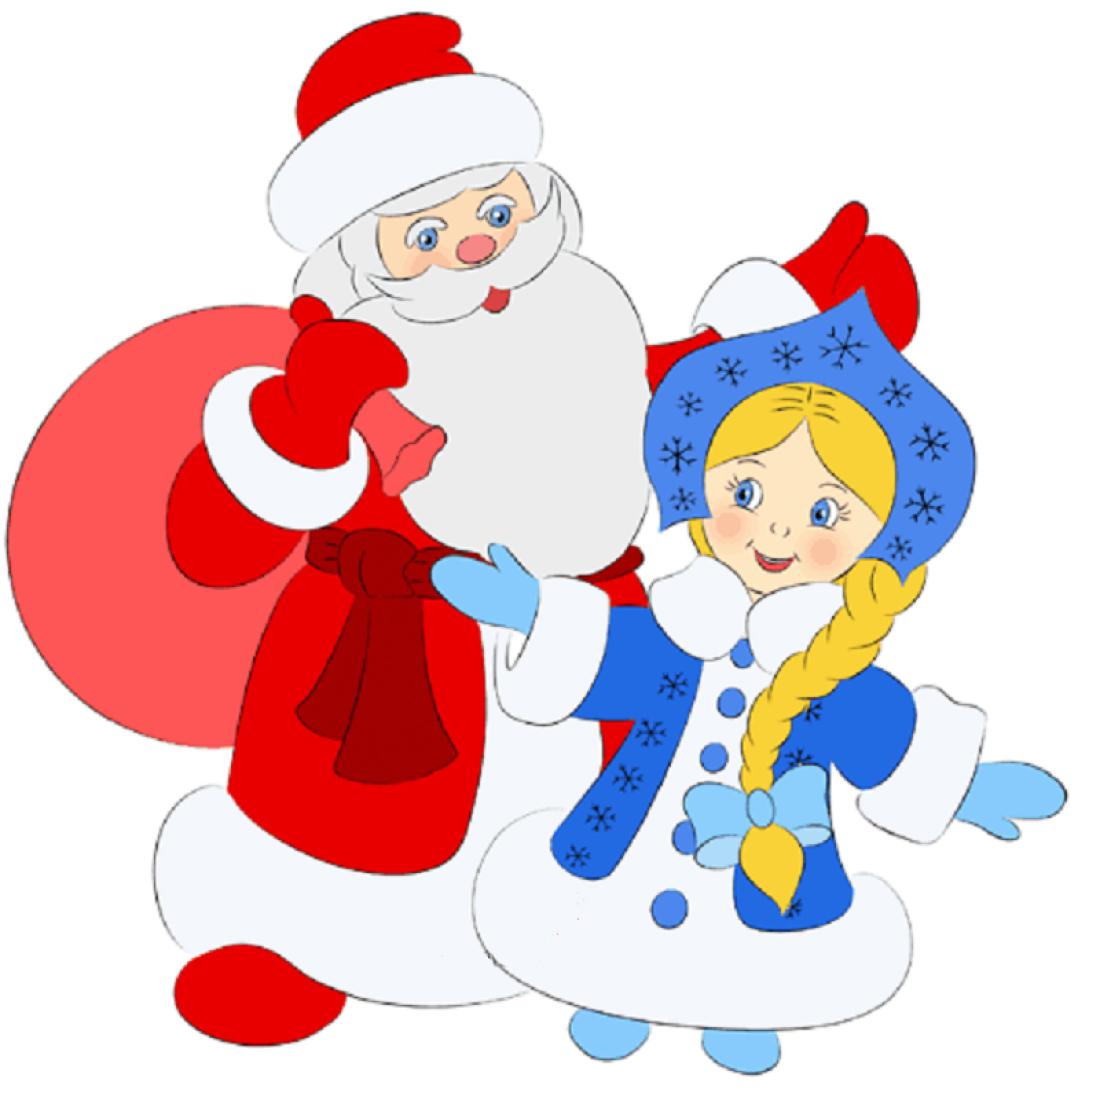 В Калугу приехал Дед Мороз